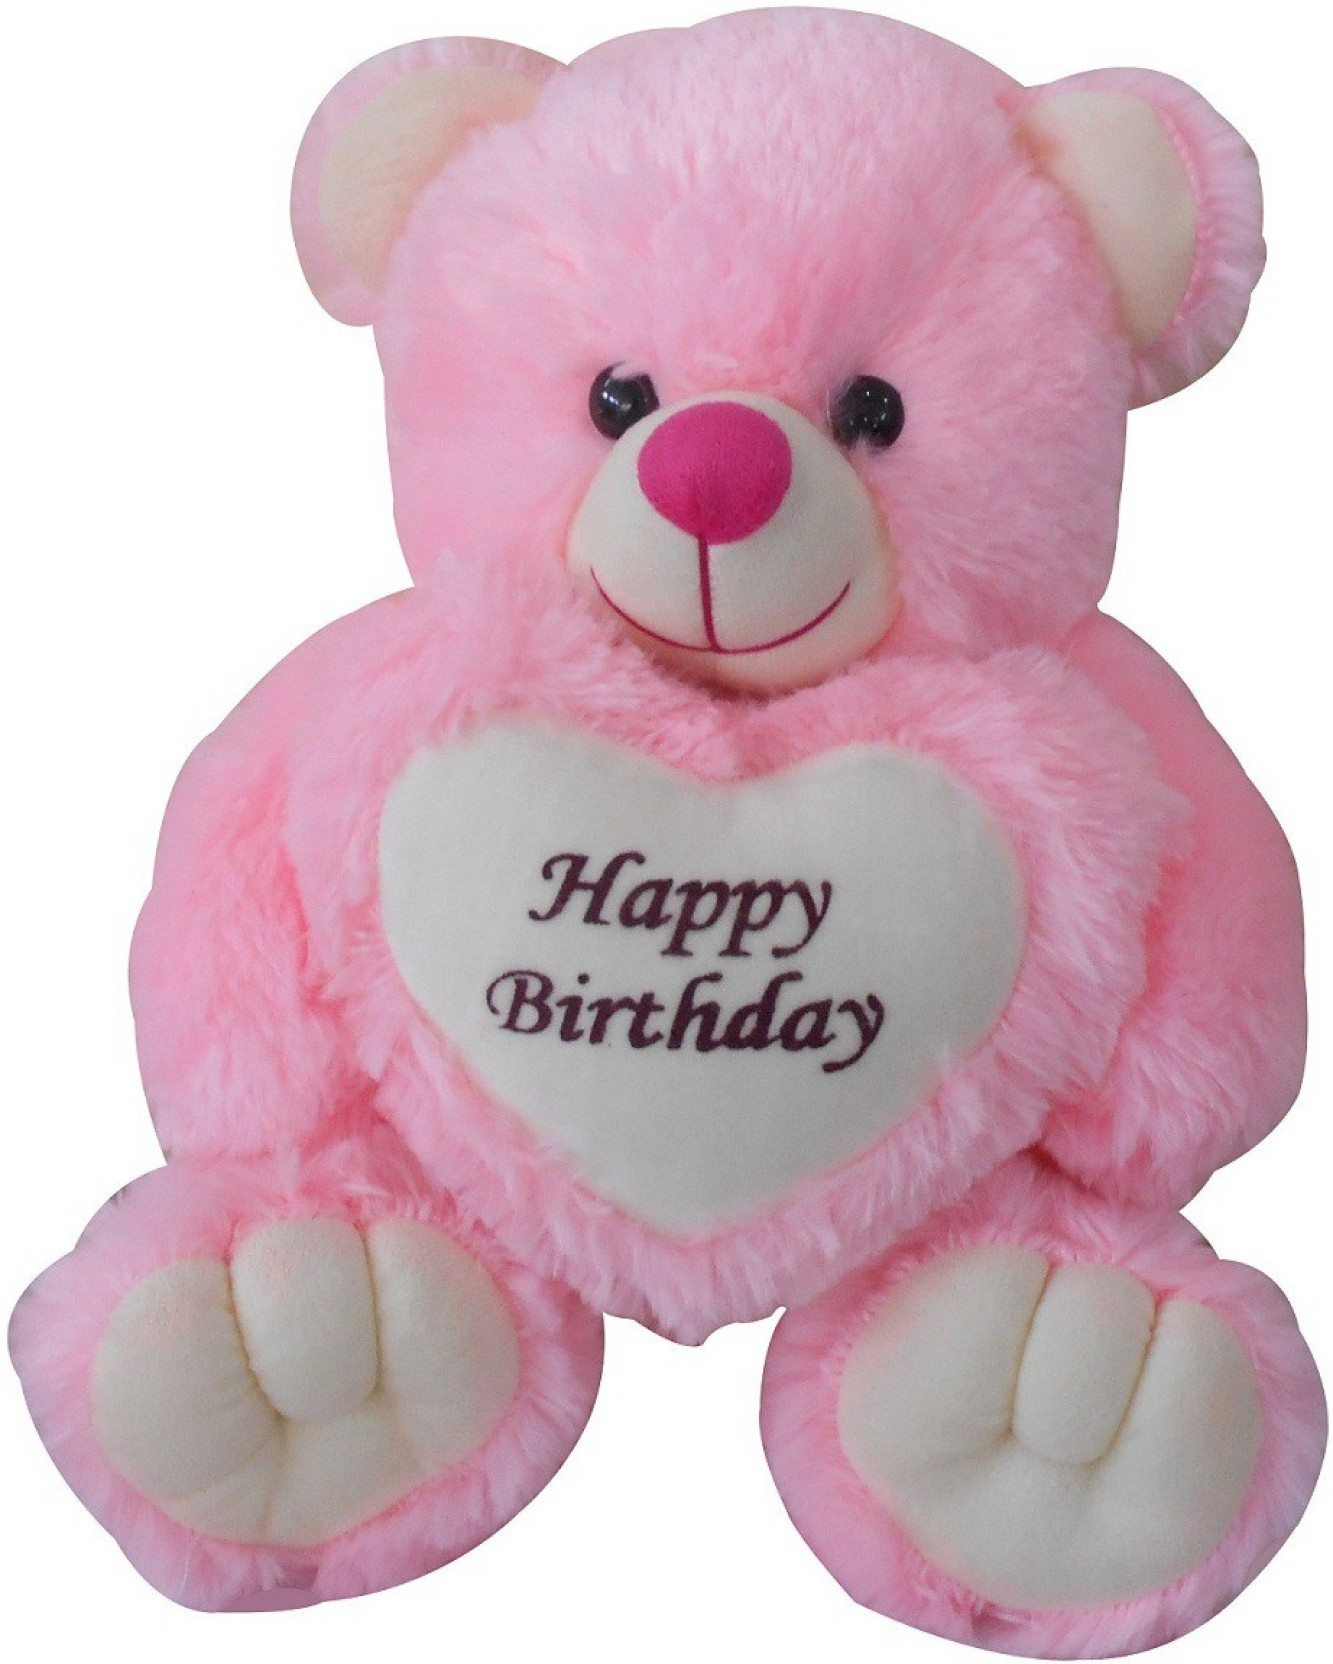 Saugat Traders Happy Birthday Teddy Bear